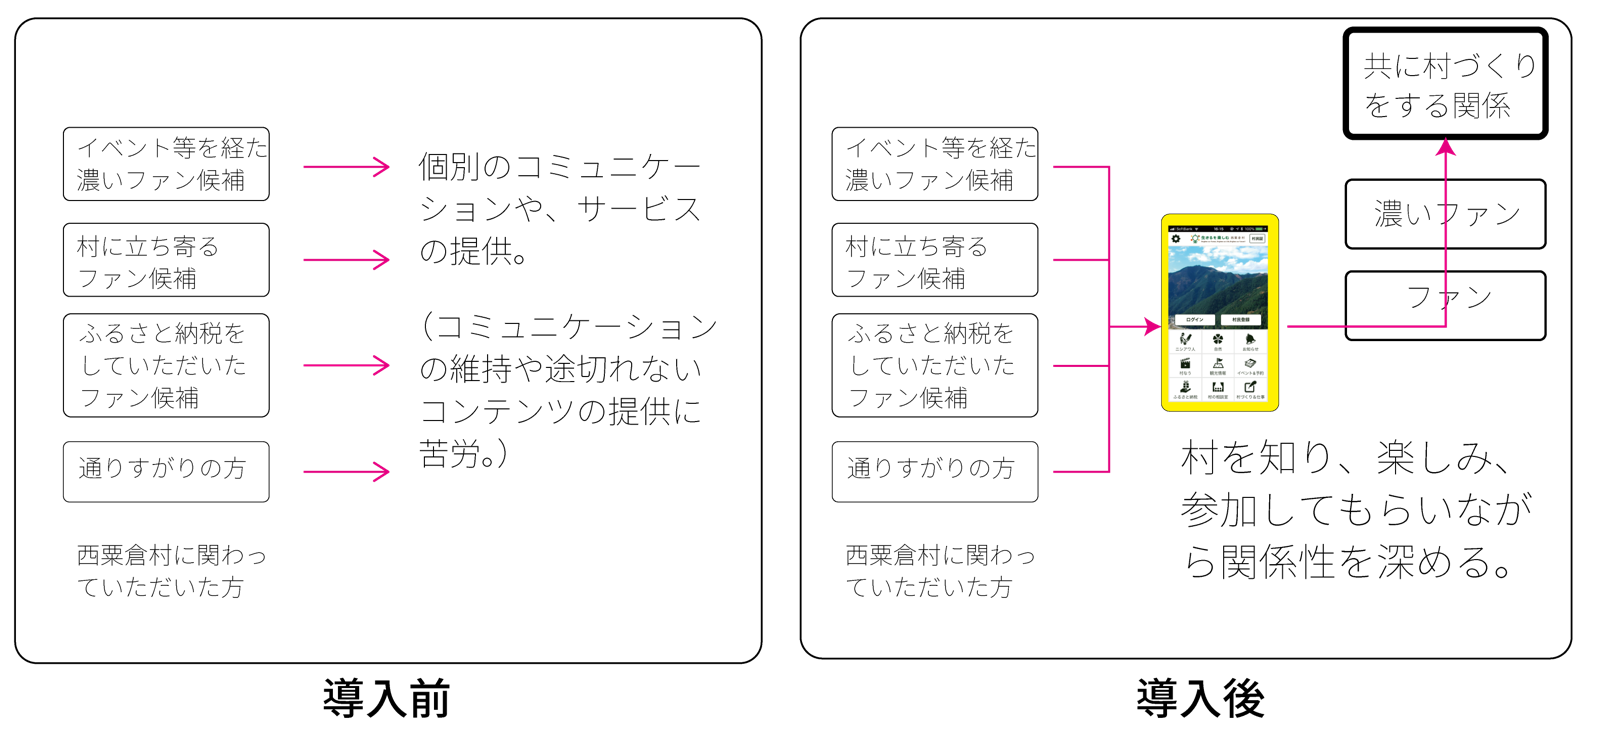 D26928-13-105935-0